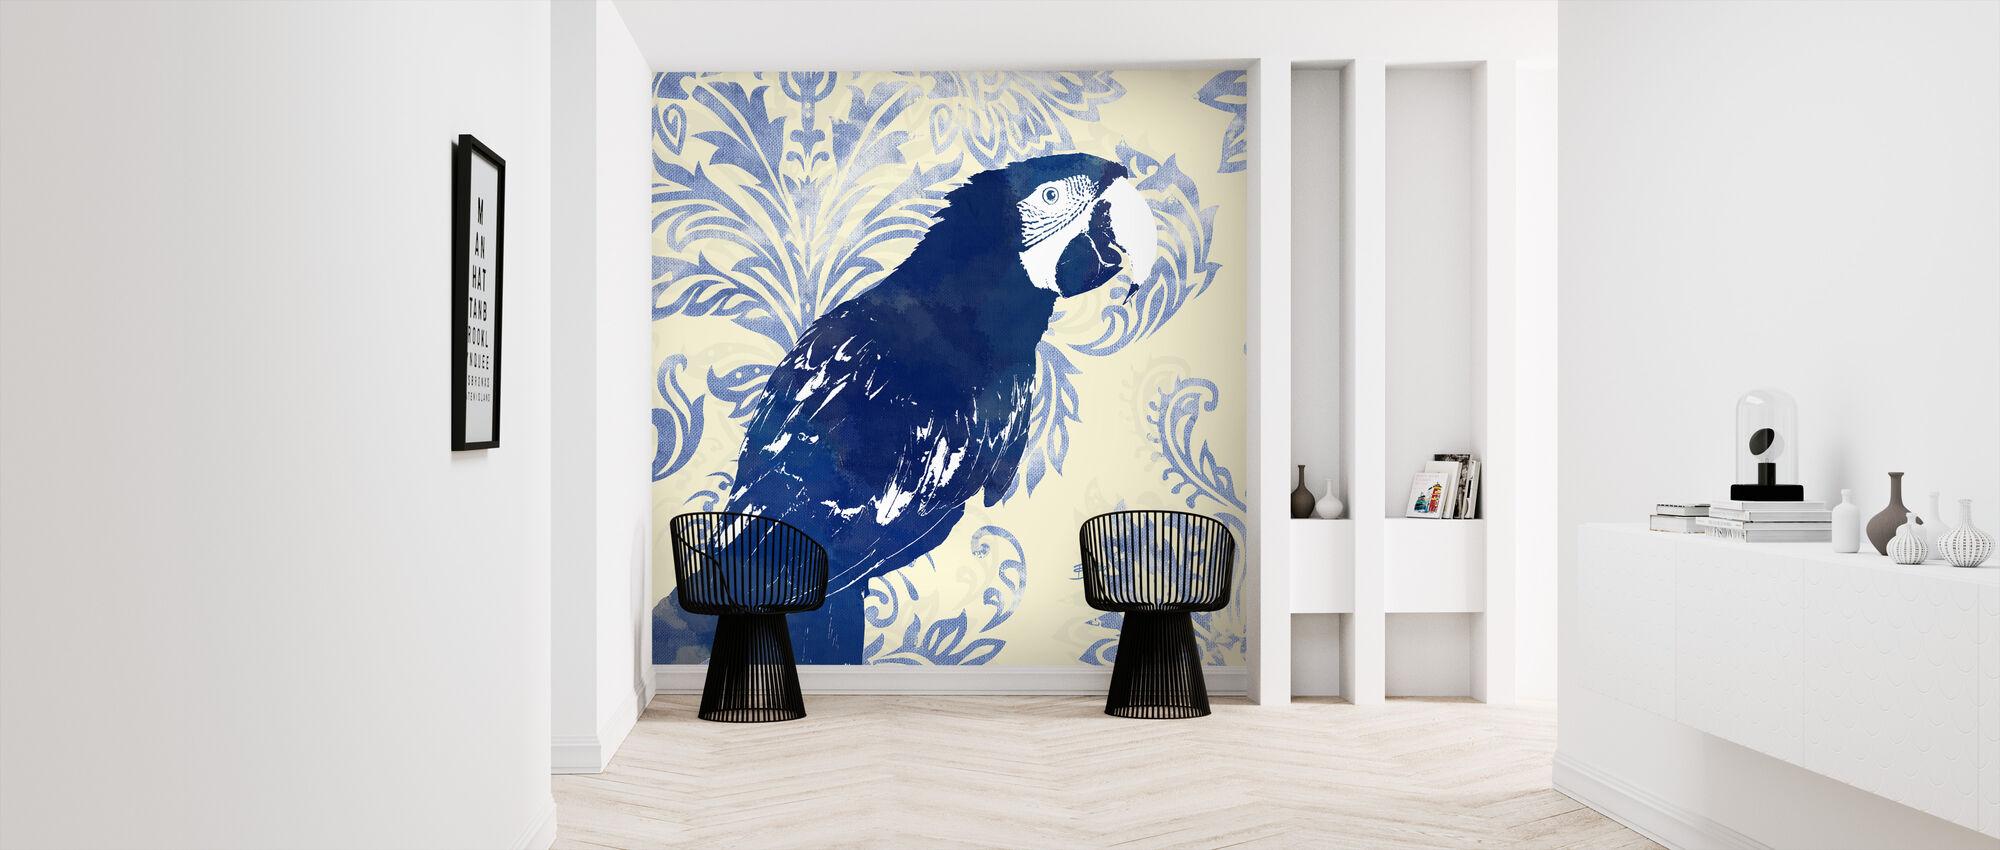 Indigo Parrot 1 - Wallpaper - Hallway